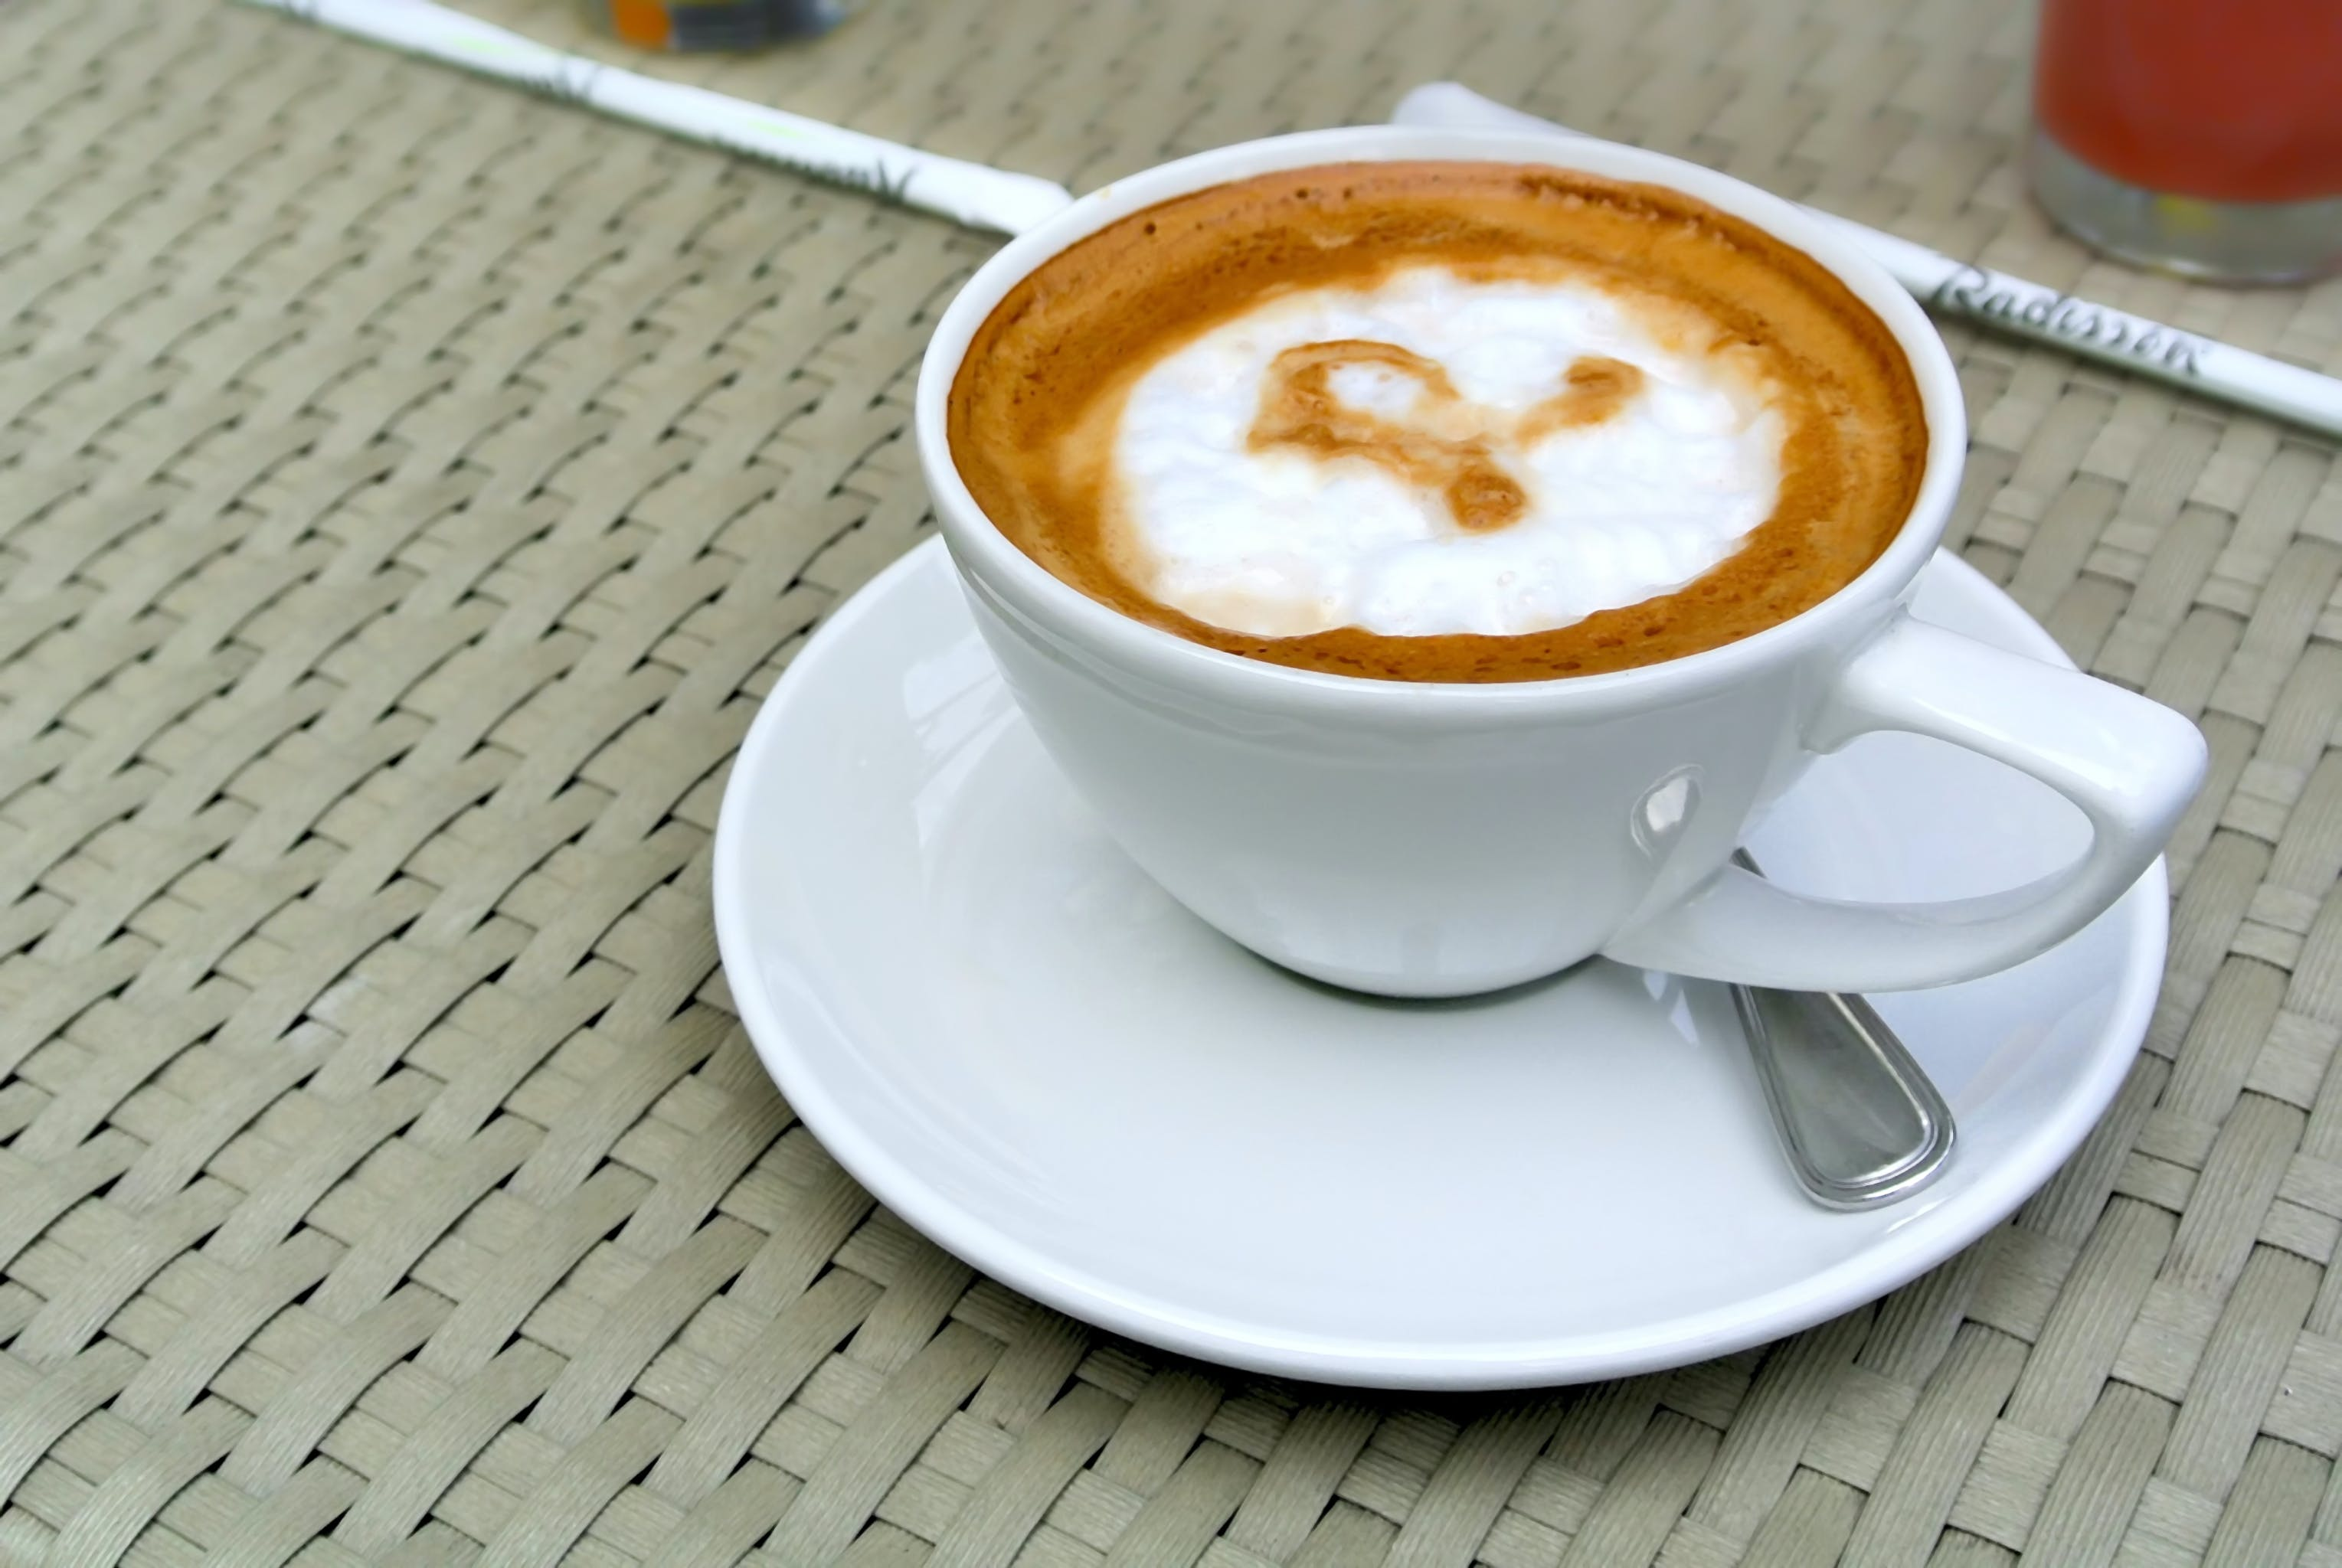 cappuccino, coffee, ejecutivos